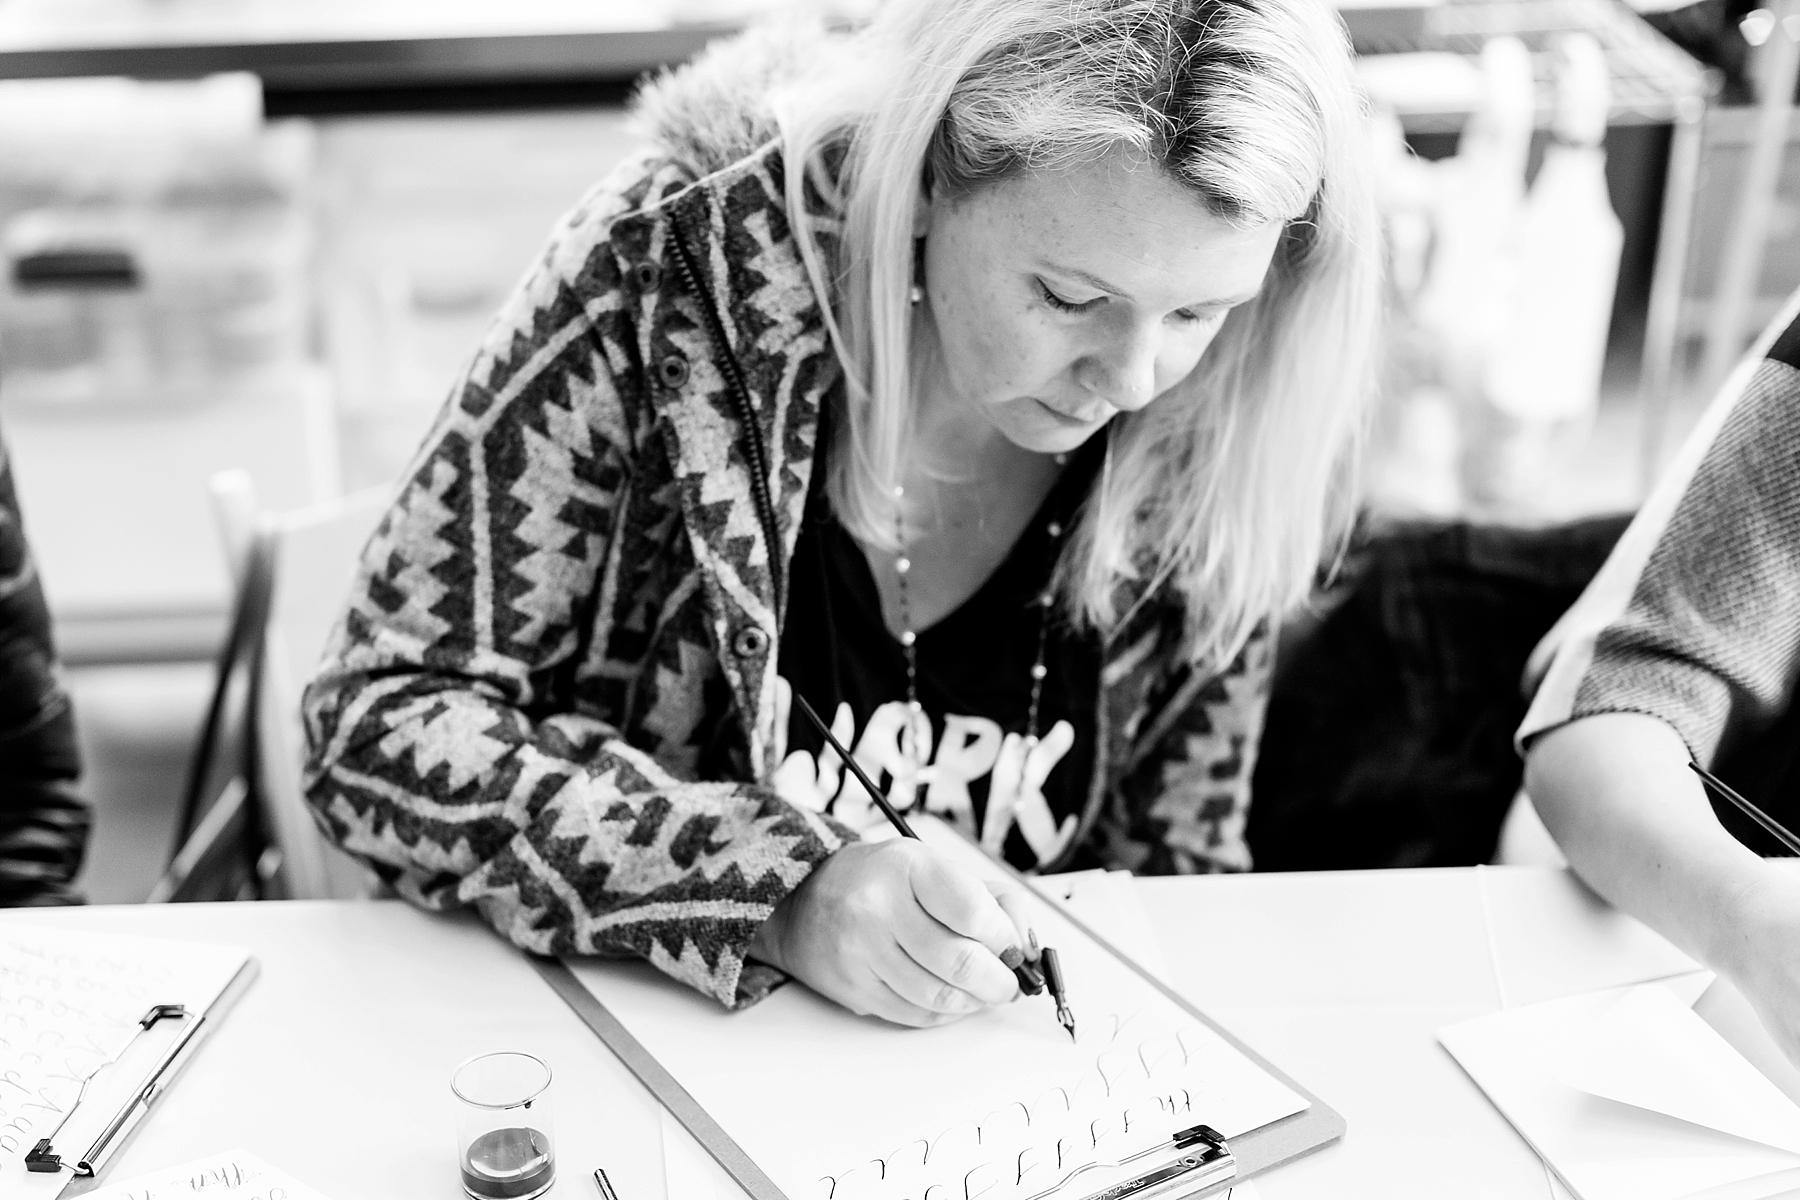 seattle-calligraphy-workshop_0046.jpg